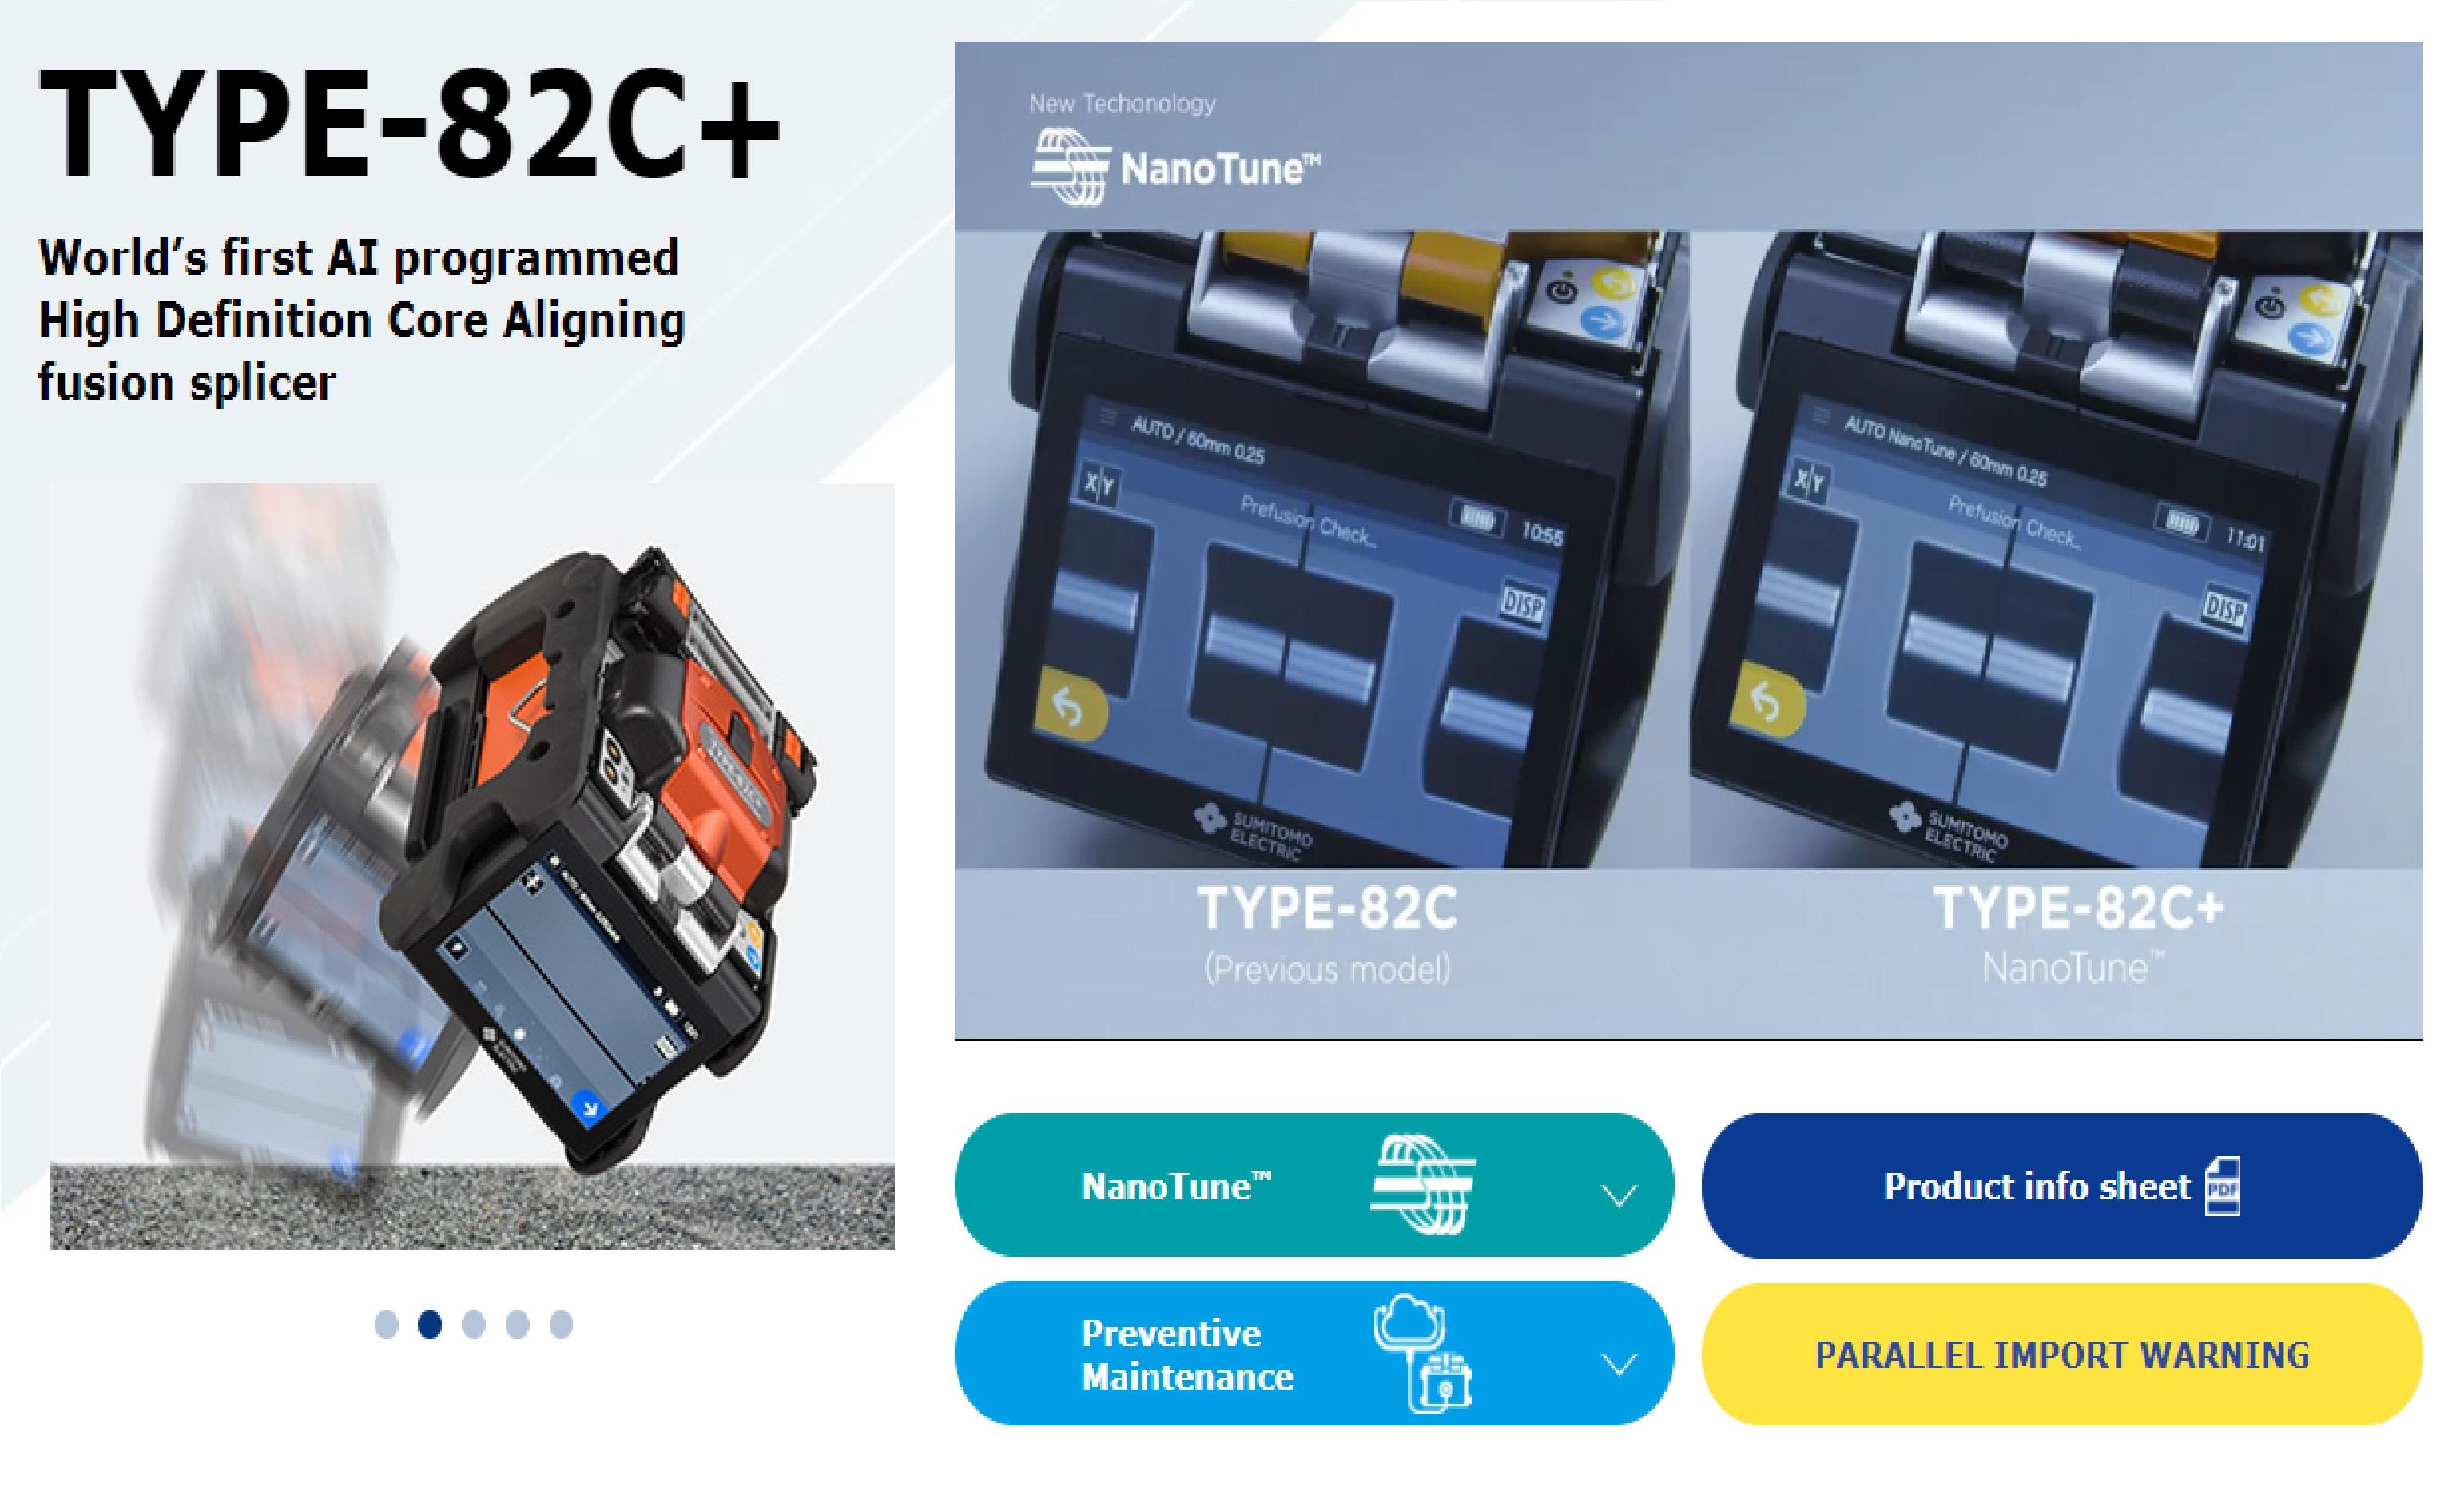 TYPE-82C+